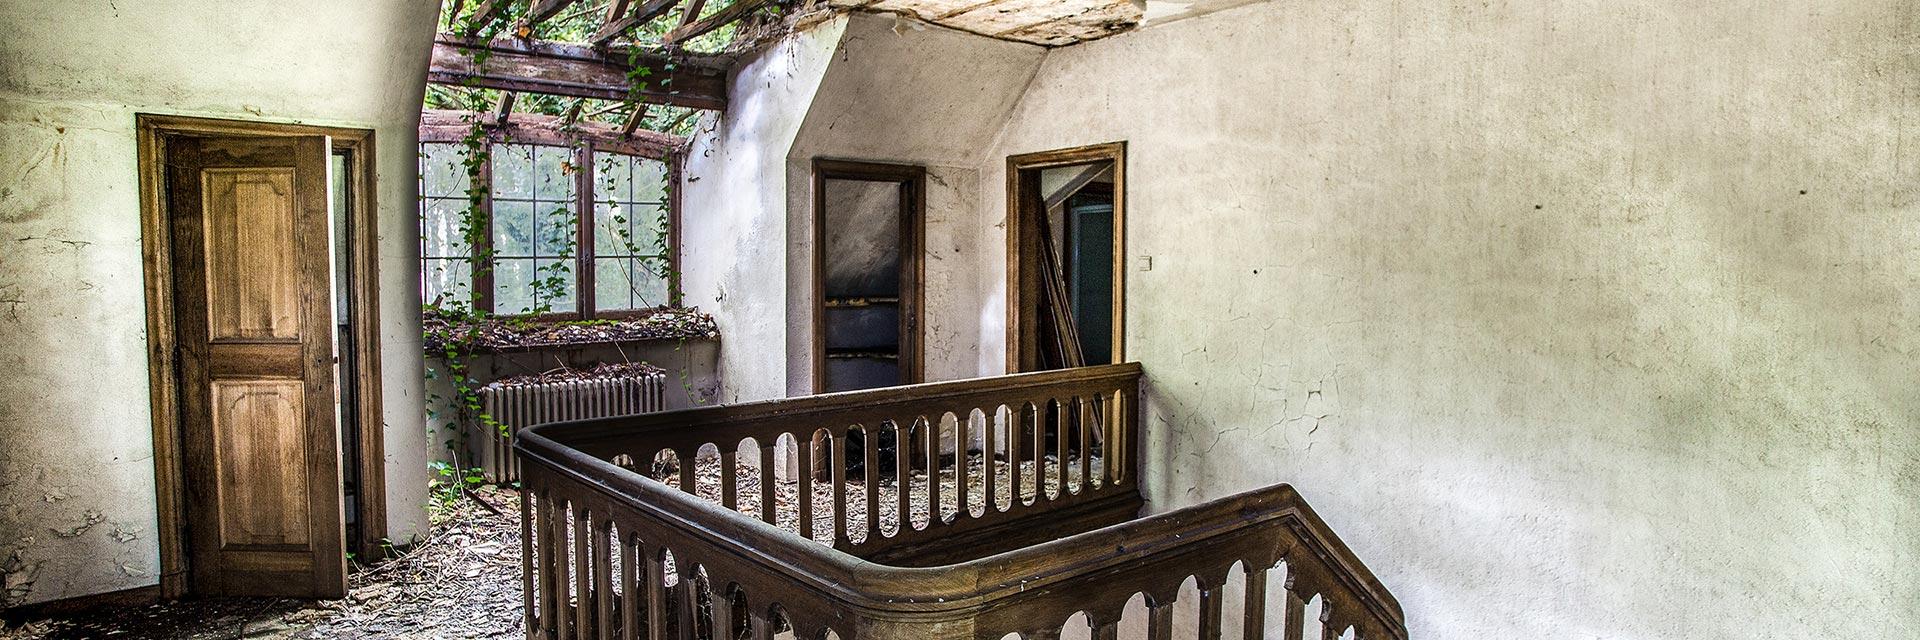 Villa SS, urbex, verlaten huis, verscholen, verlaten